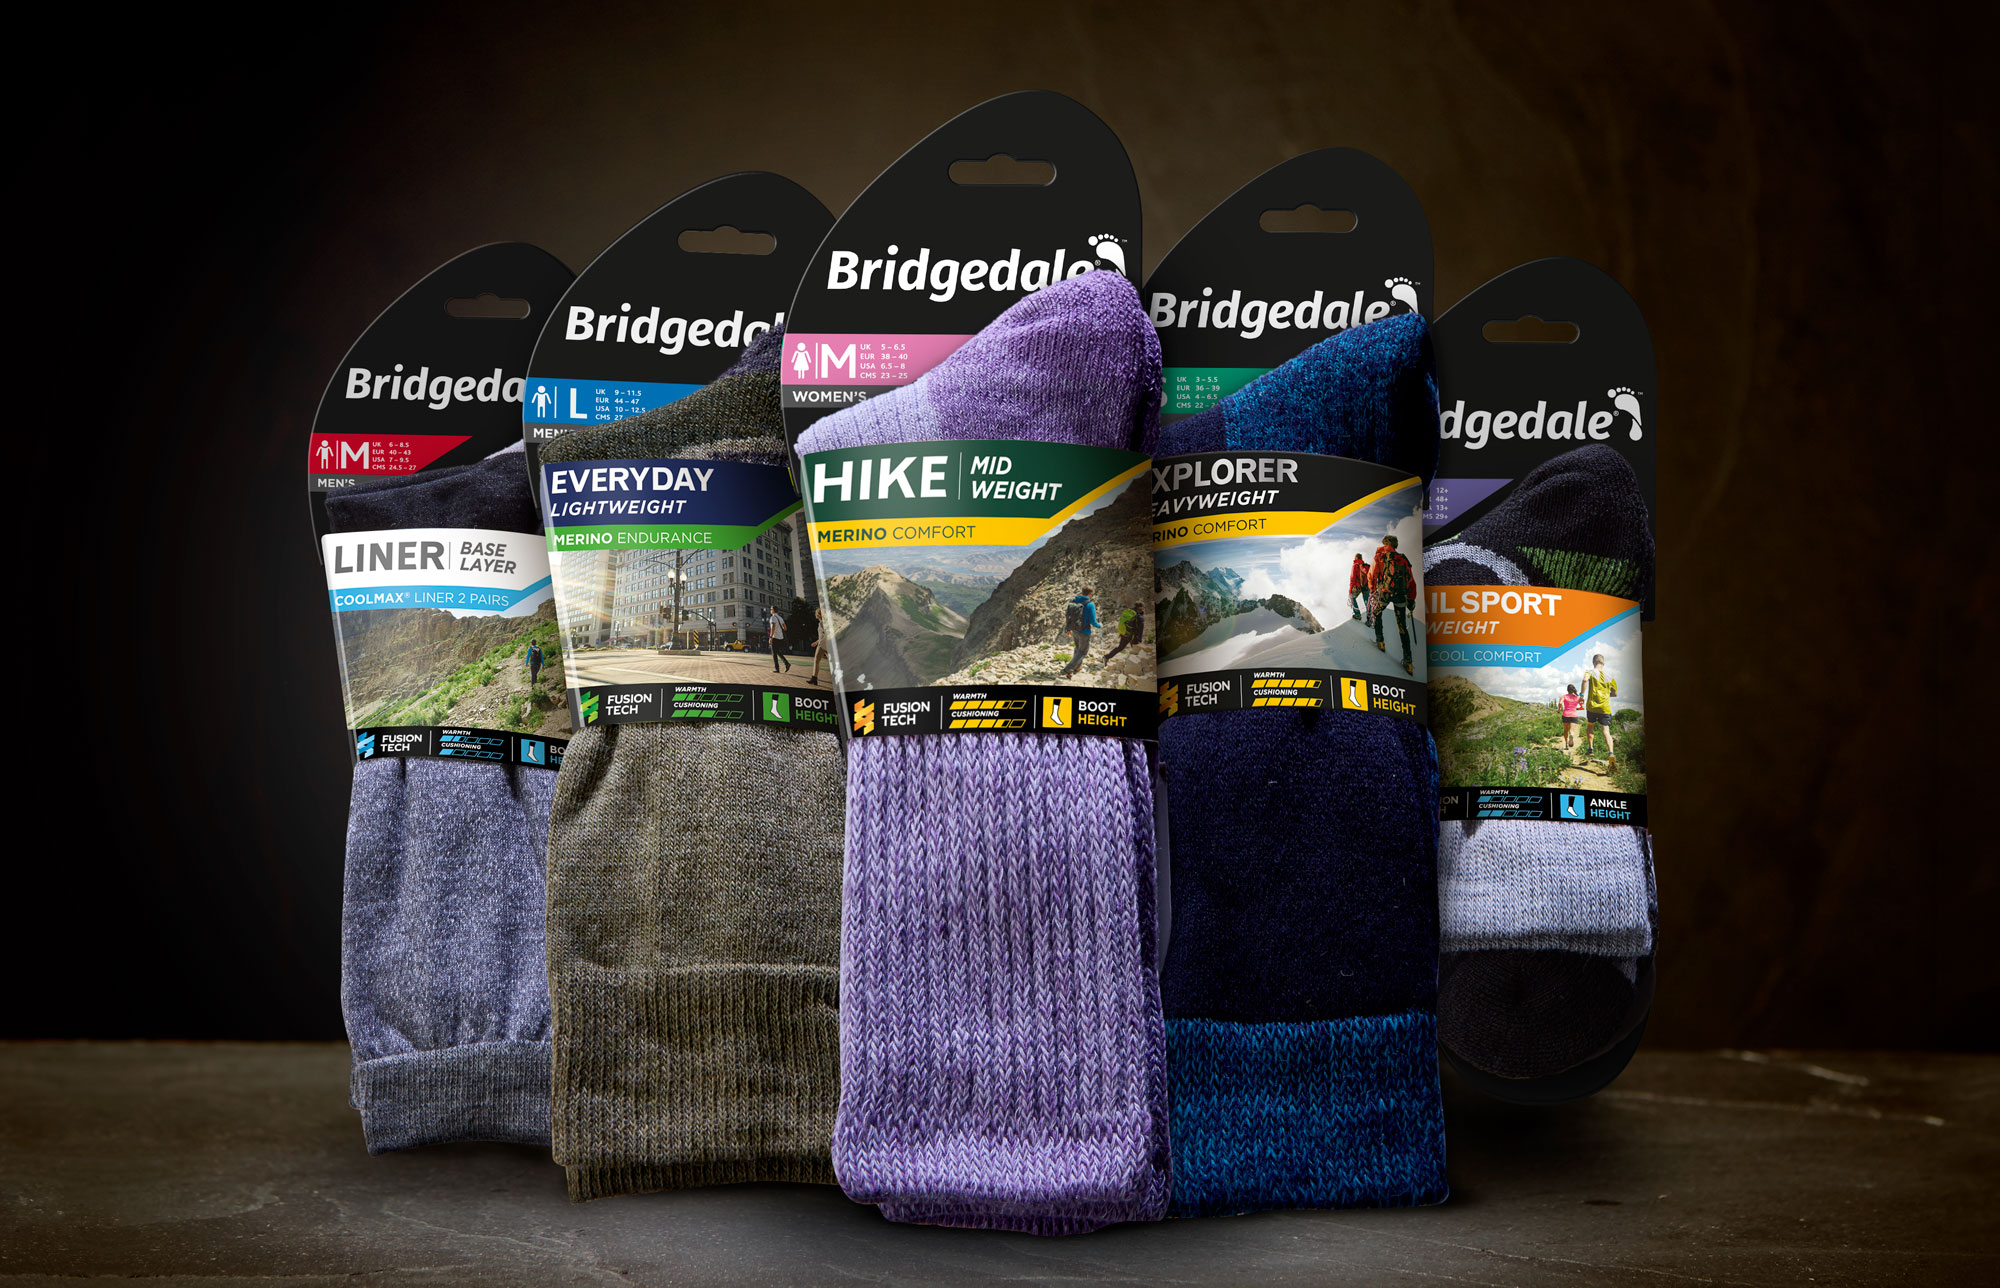 Updated Brand Identity and Improved SKU Navigational System for Socks